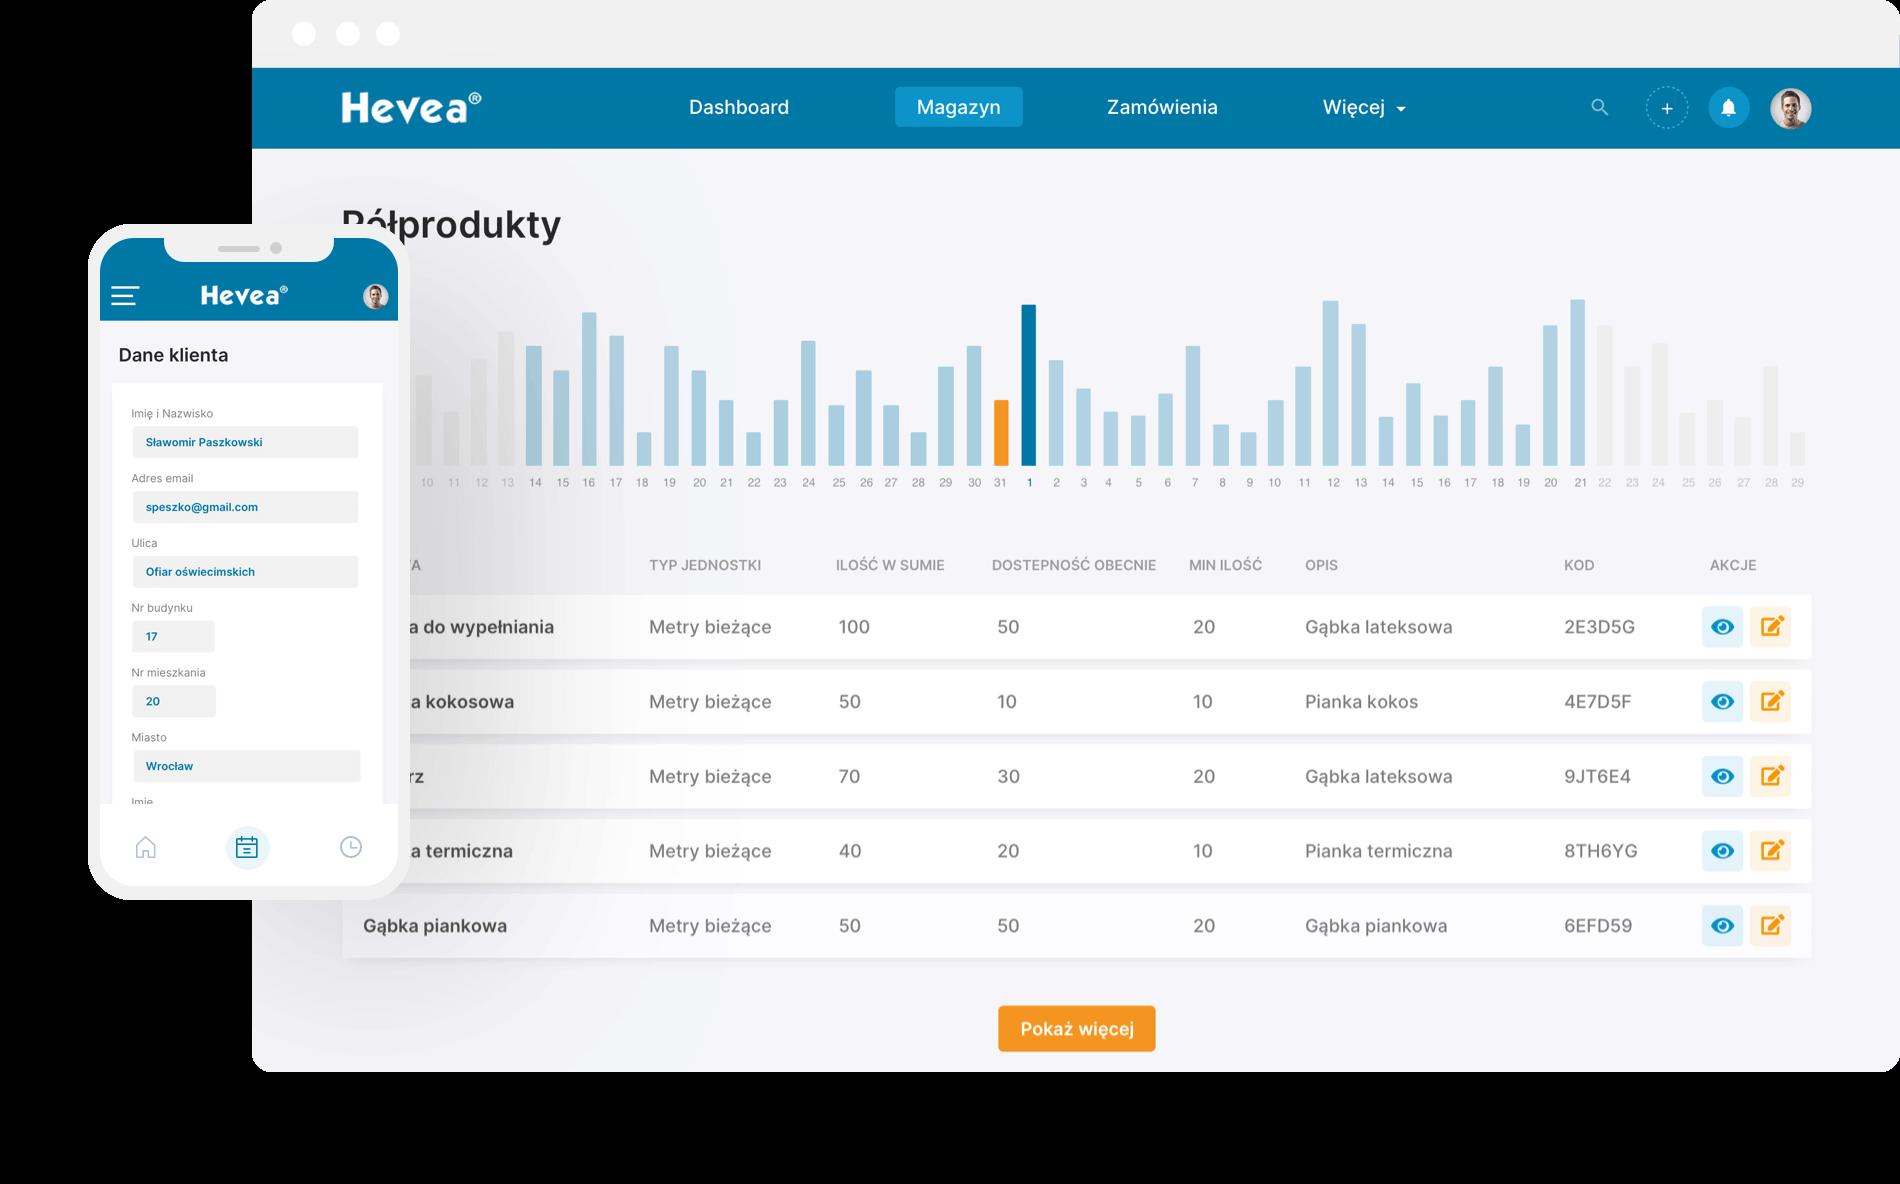 Hevea - mobile and web app